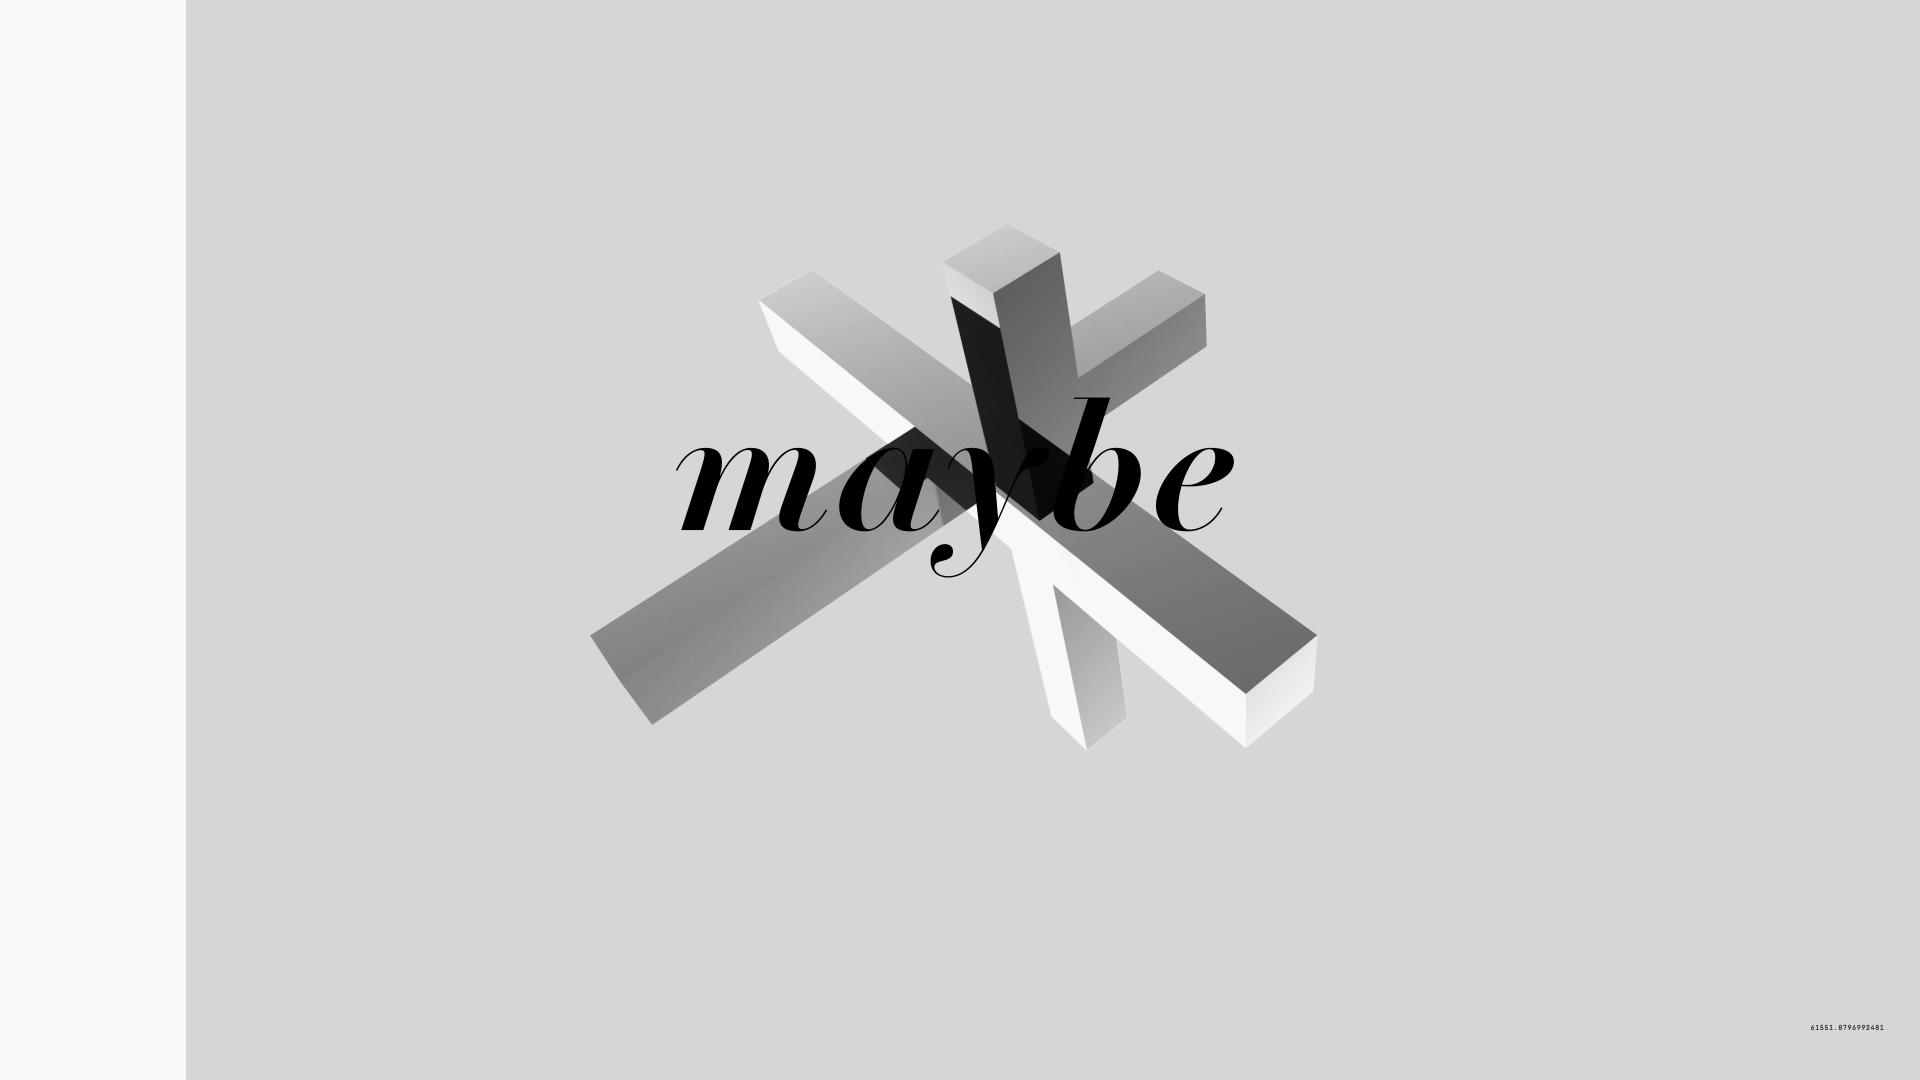 Alice_Rose_Moniko_Mayfly_directors_cut_4.jpg